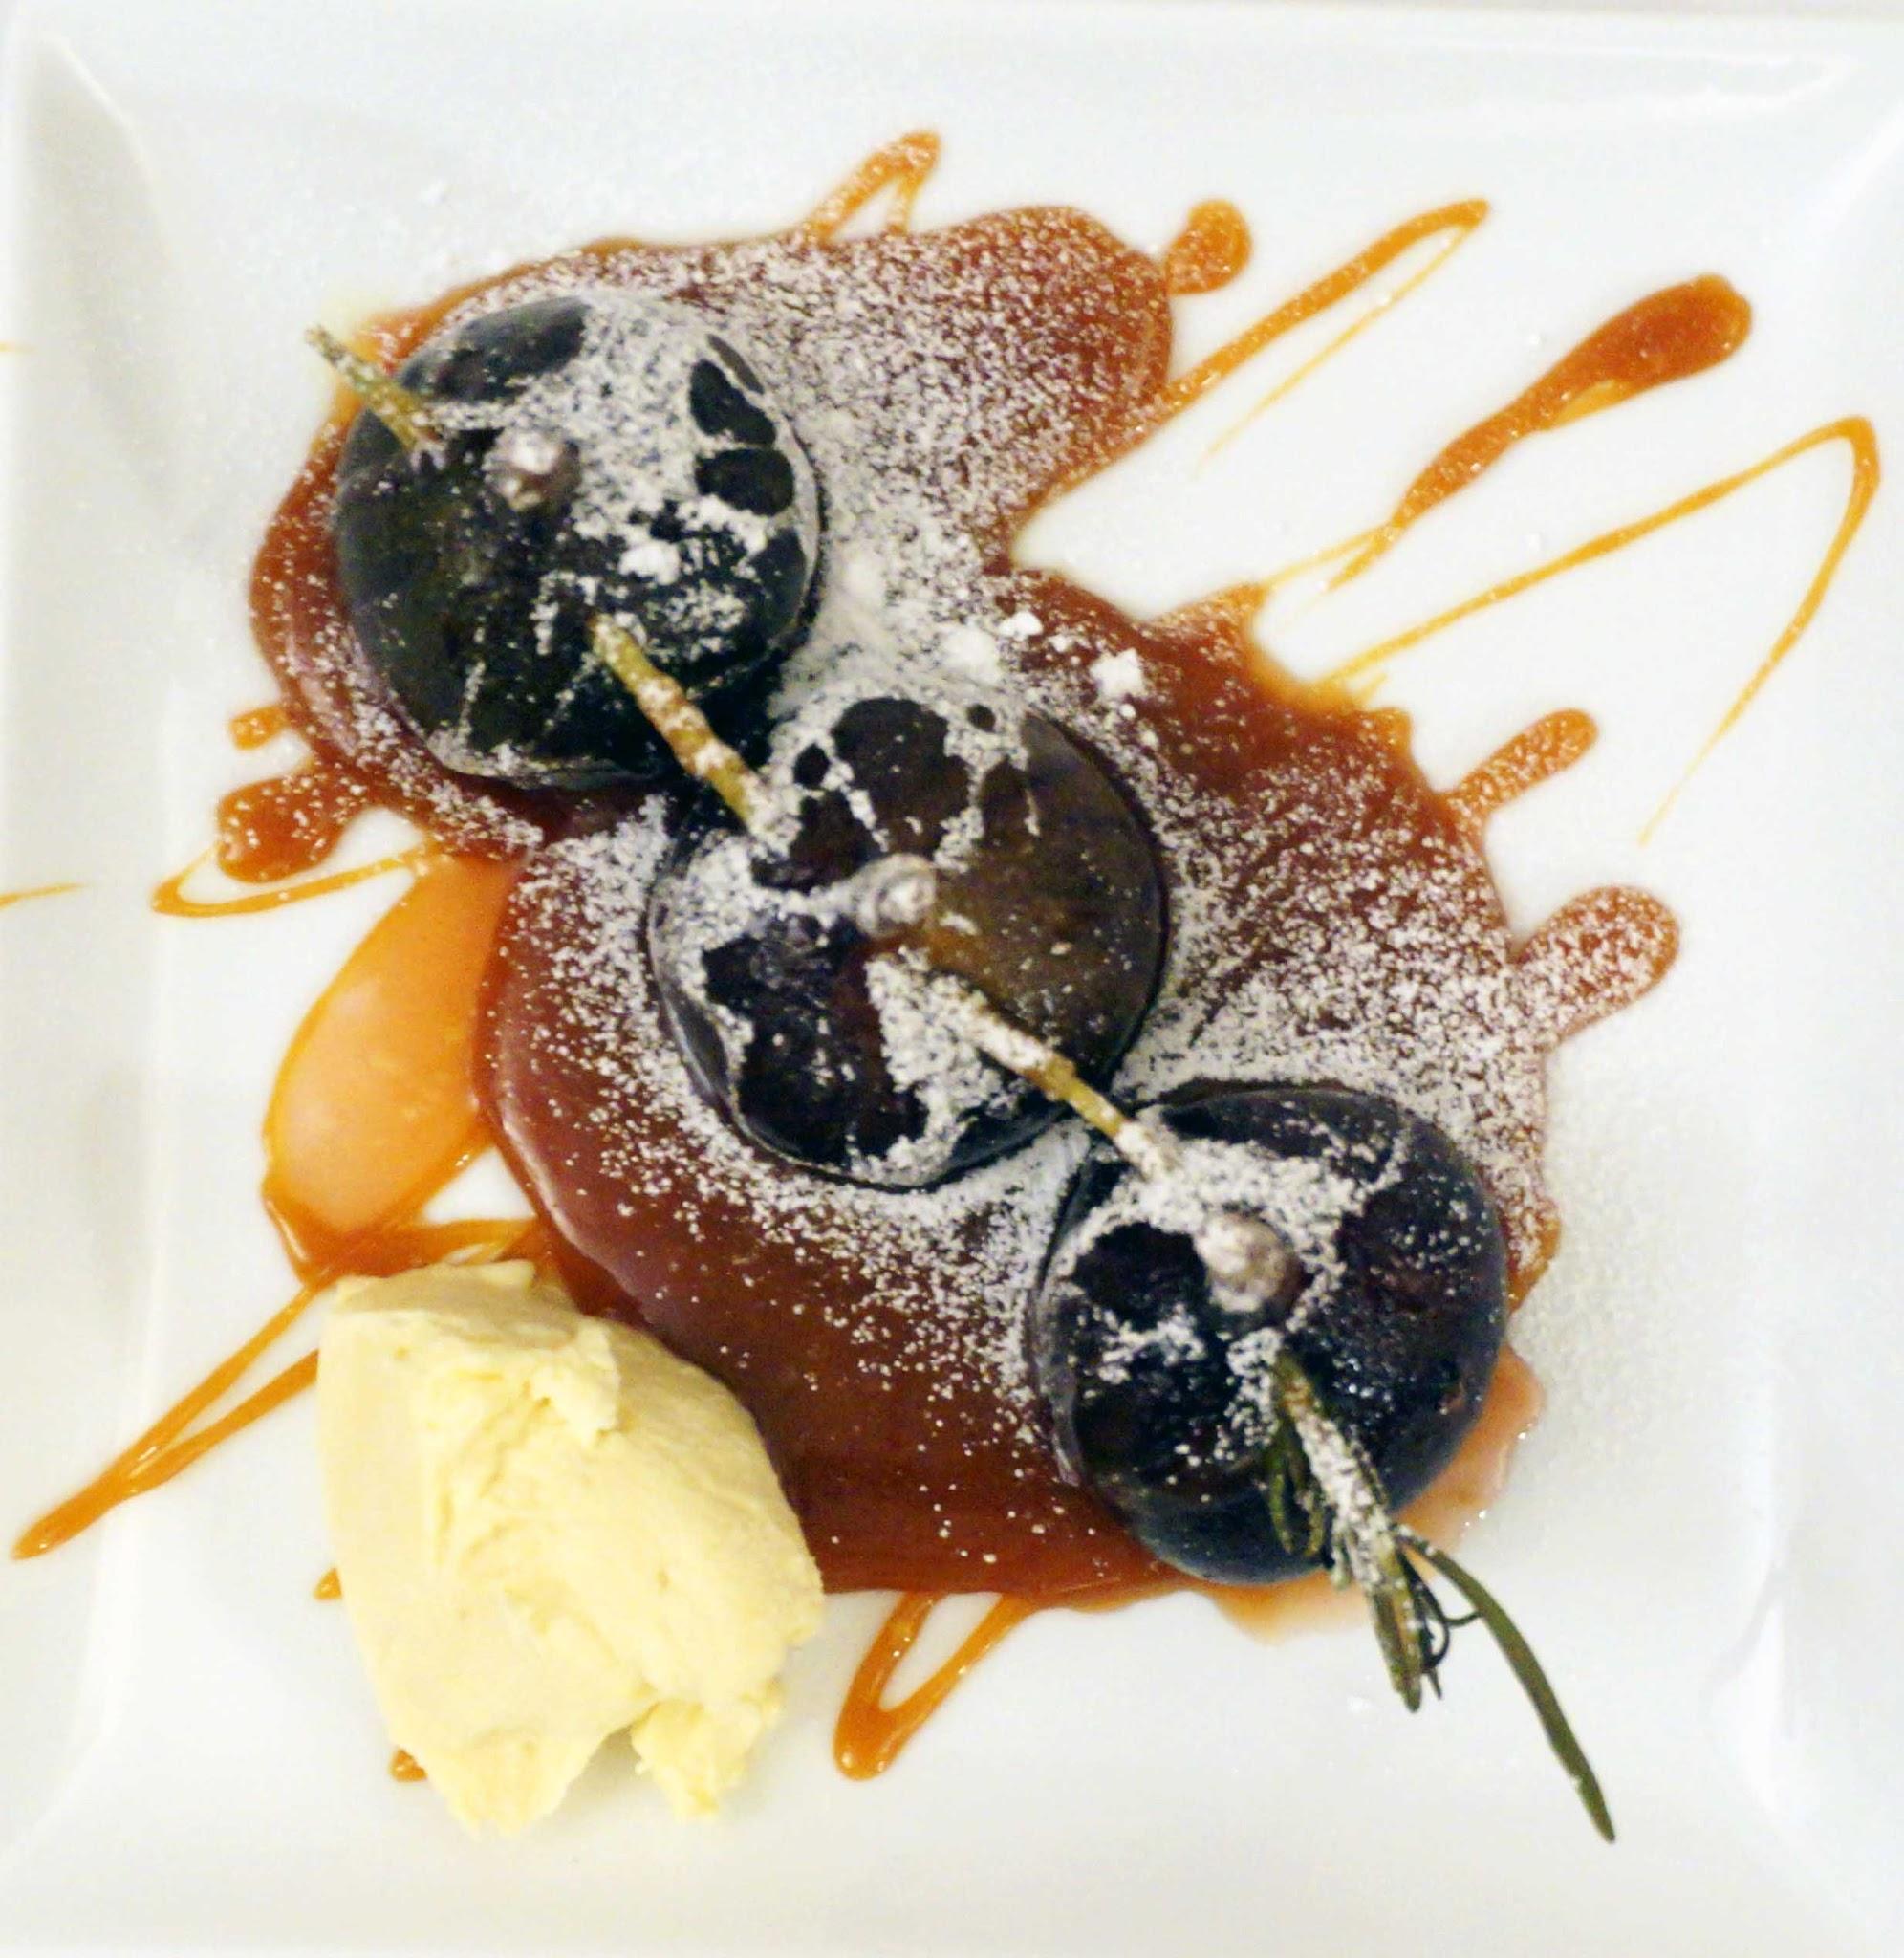 Gordon Ramsay caramelised figs